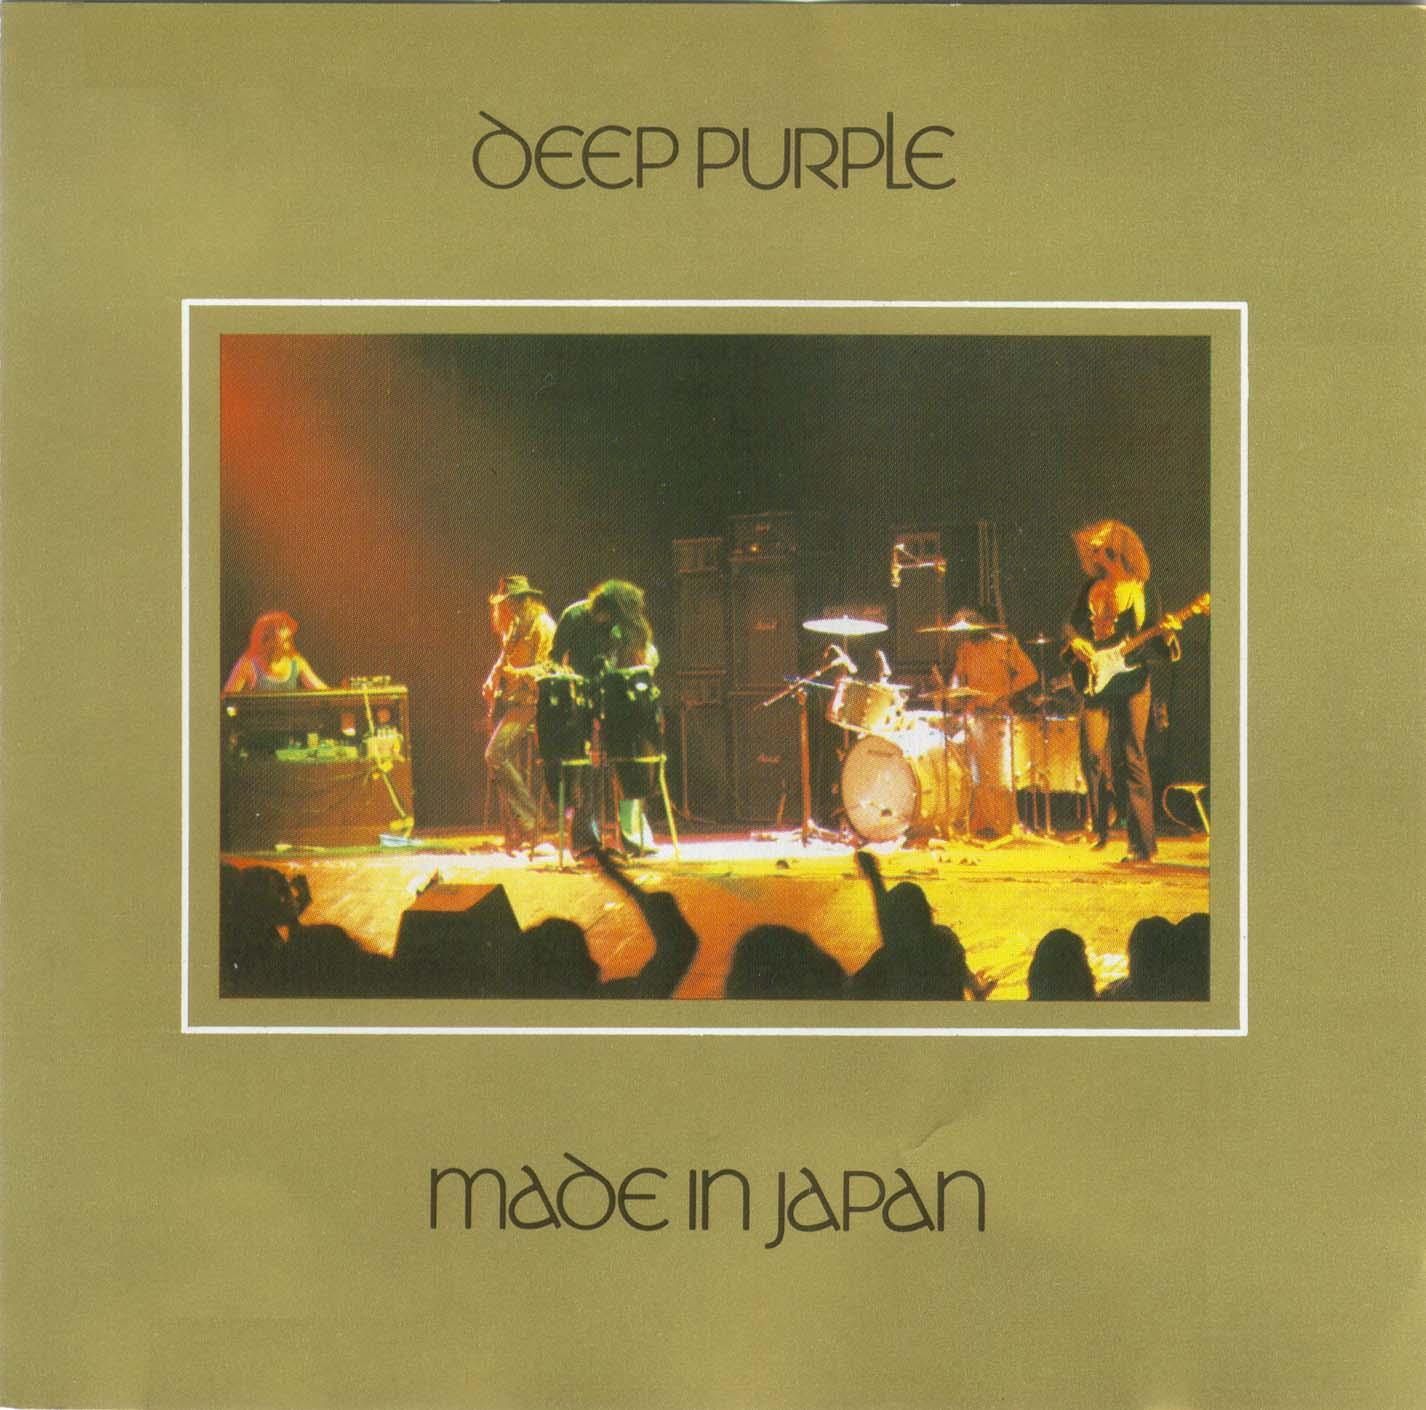 Made in Japan (Reedición)